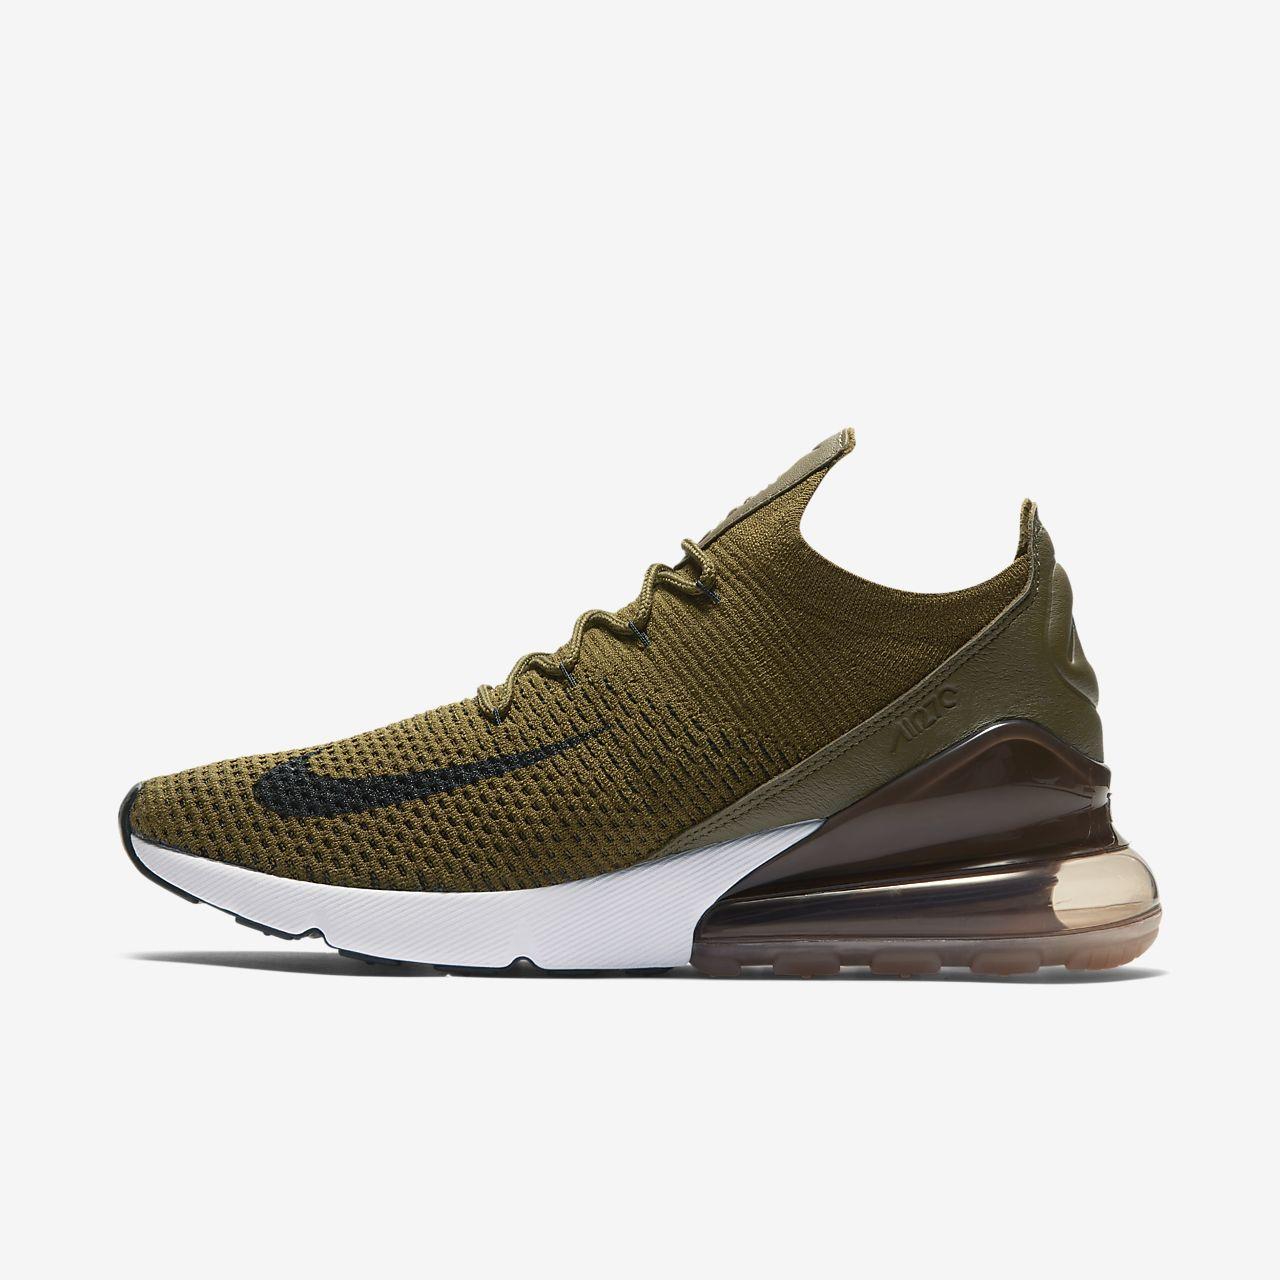 free shipping 9b837 38878 ... Nike Air Max 270 Flyknit Mens Shoe